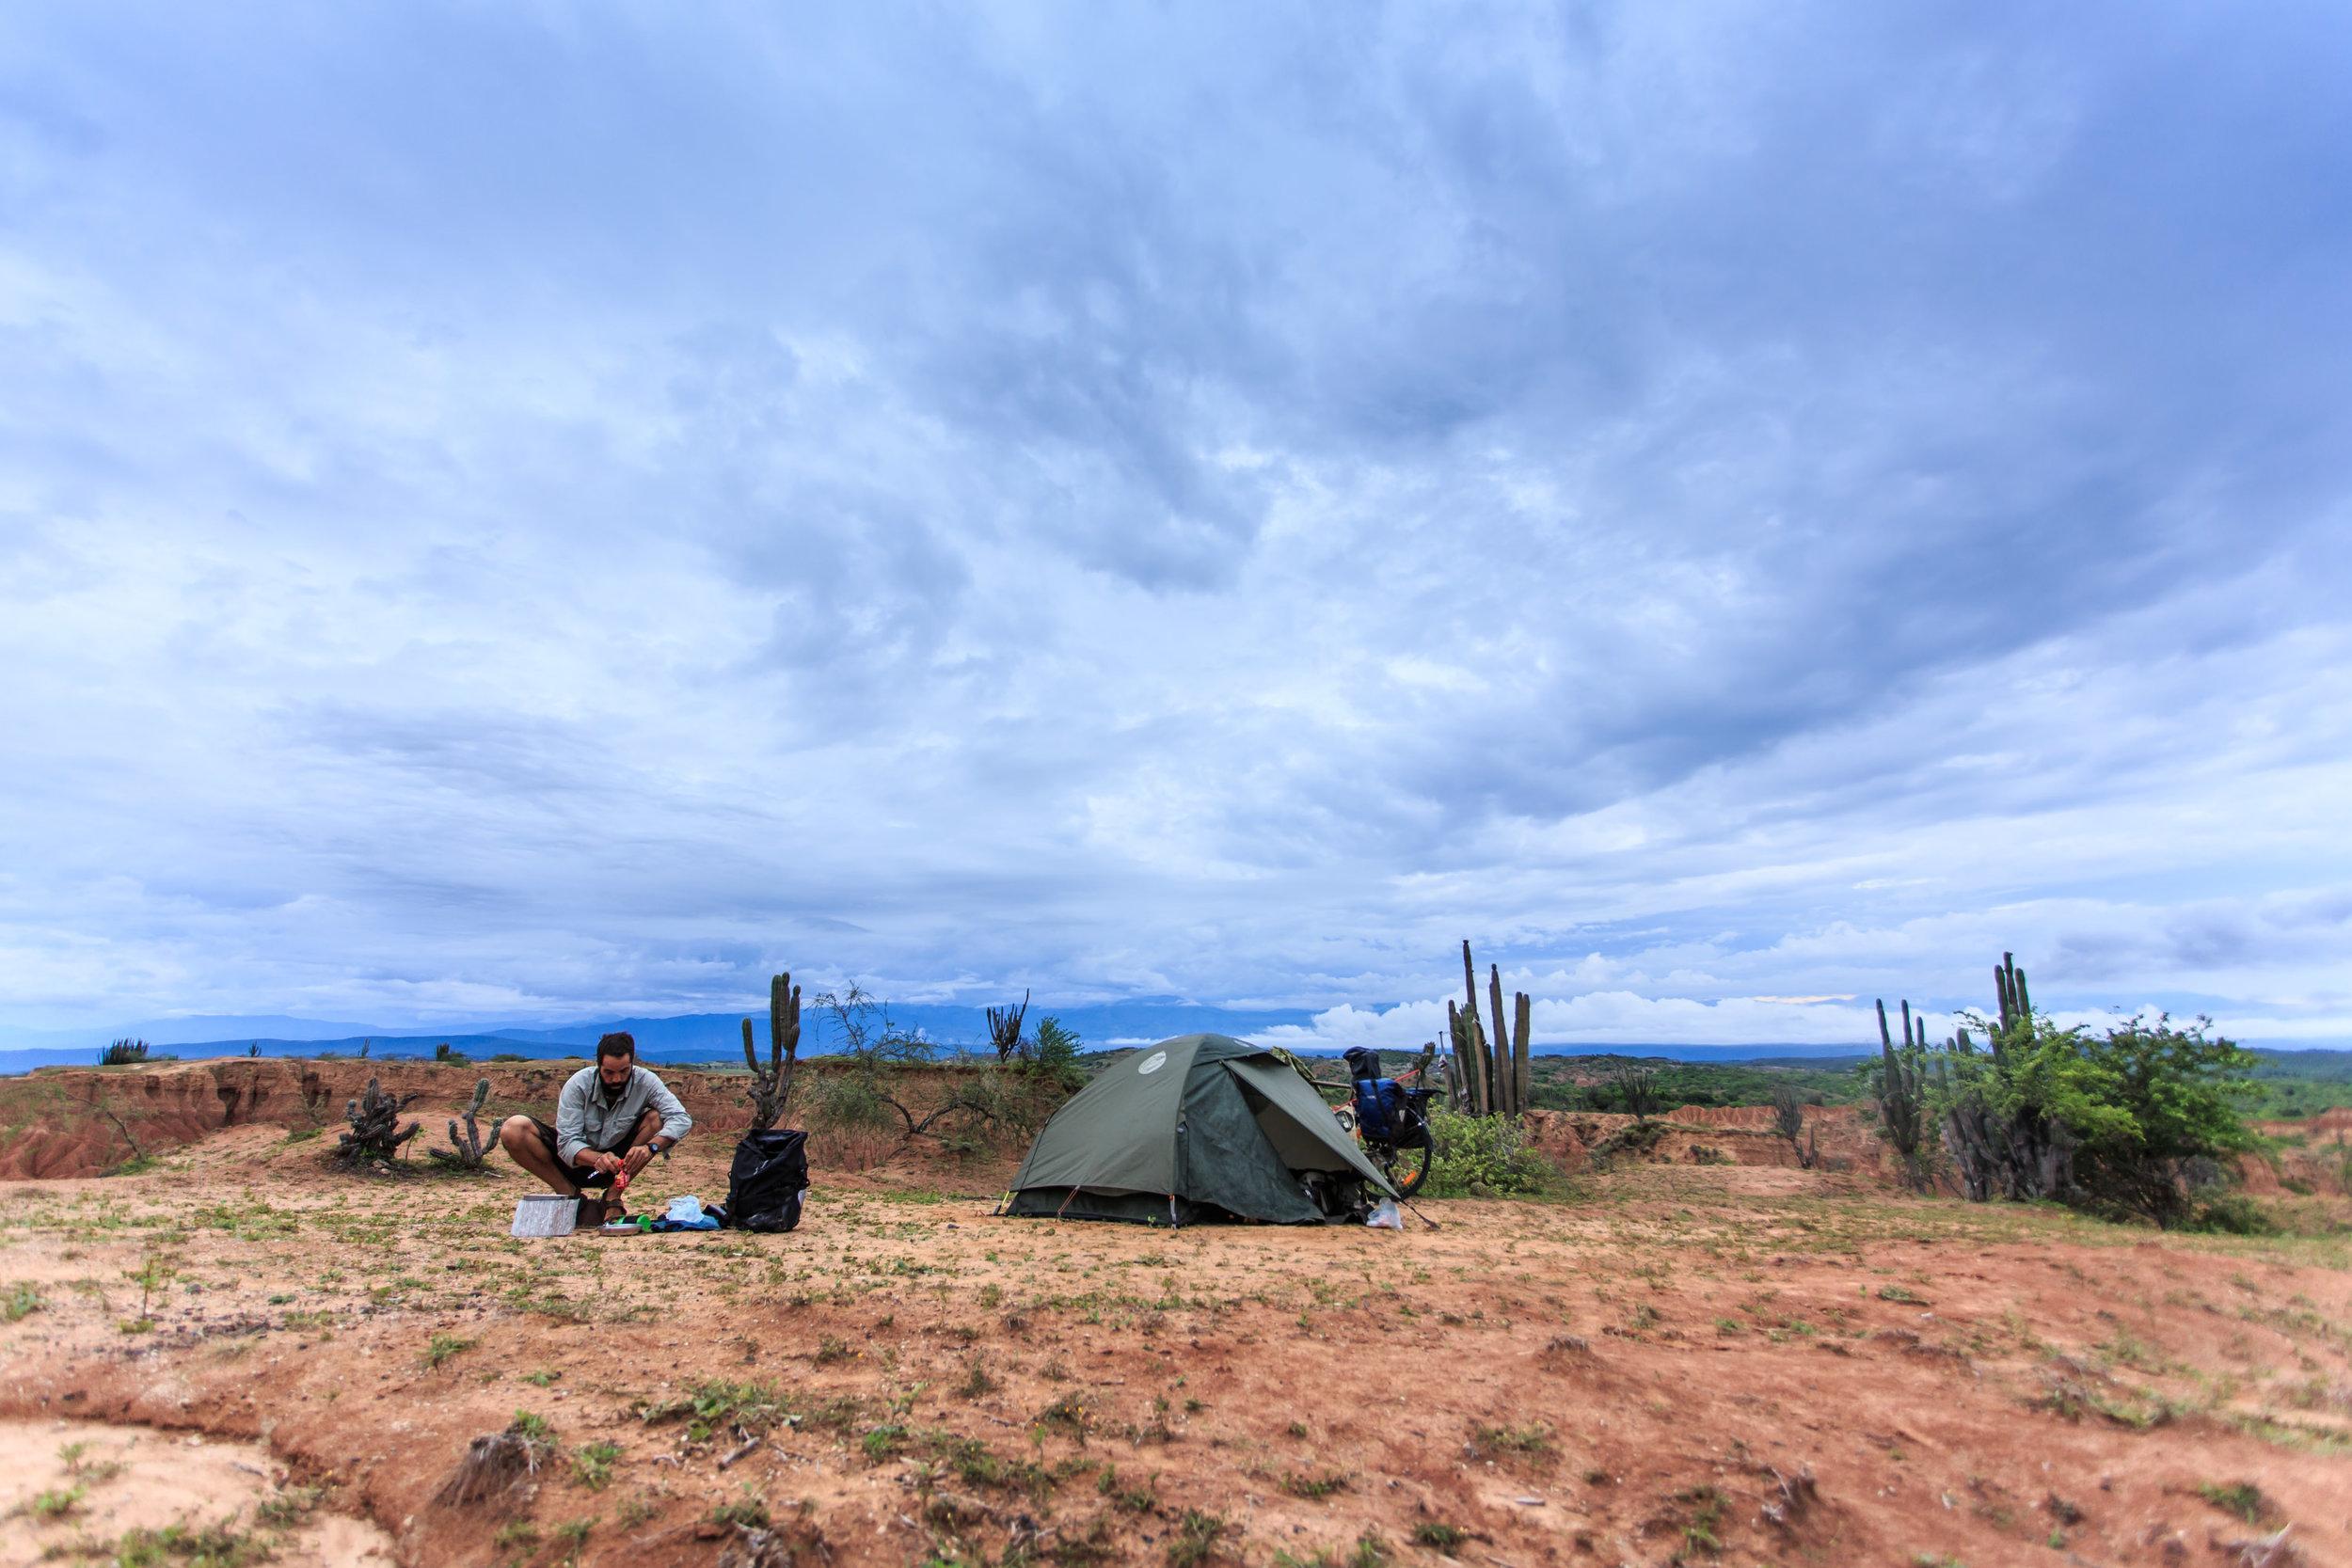 Horizonte Norte. El viaje de Juan Sisto desde Chile a Alaska en bicicleta. Desierto de la Tatacoa, 2014.